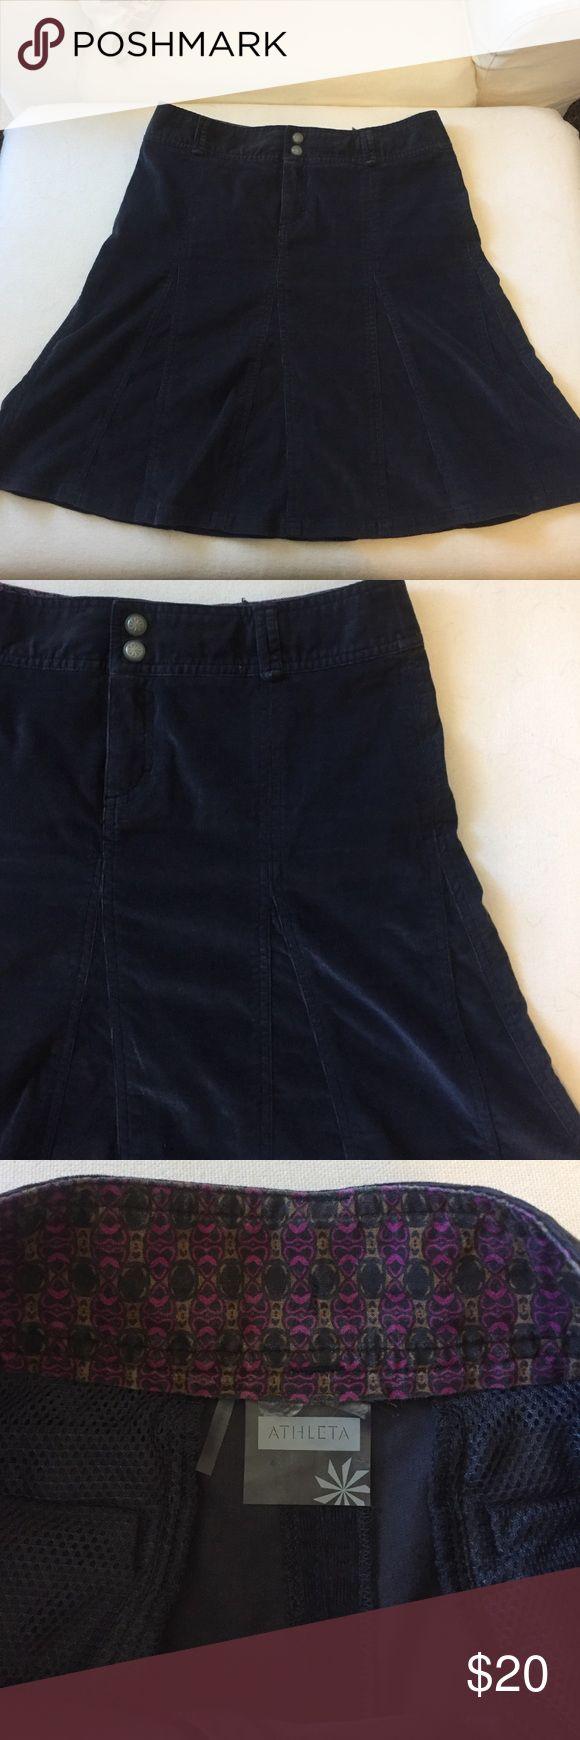 Gray Athleta skirt size 4 Adorable gray athletic skirt size 4. 98% cotton 2% spandex. Machine wash cold. Great condition like new Athleta Skirts Midi